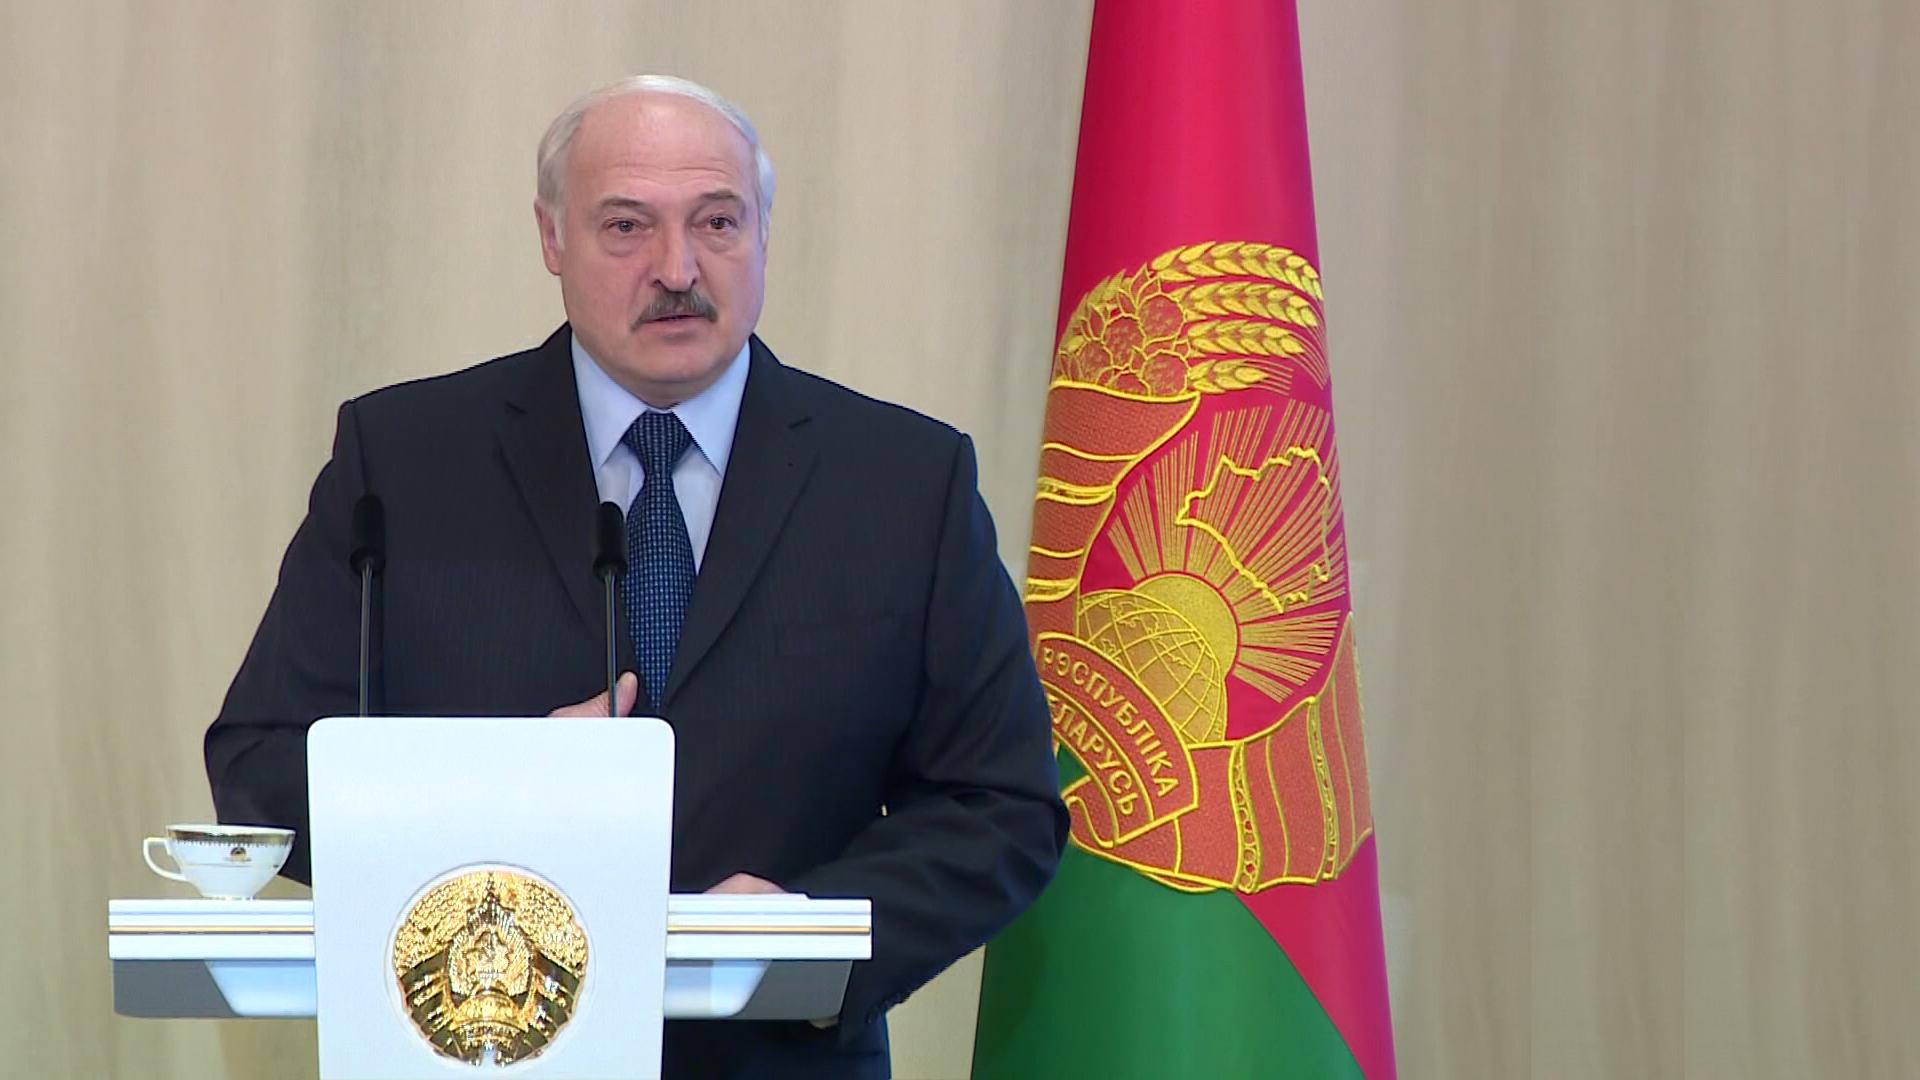 lukashenko - Александр Лукашенко встретился с активом области в Витебске (видео)